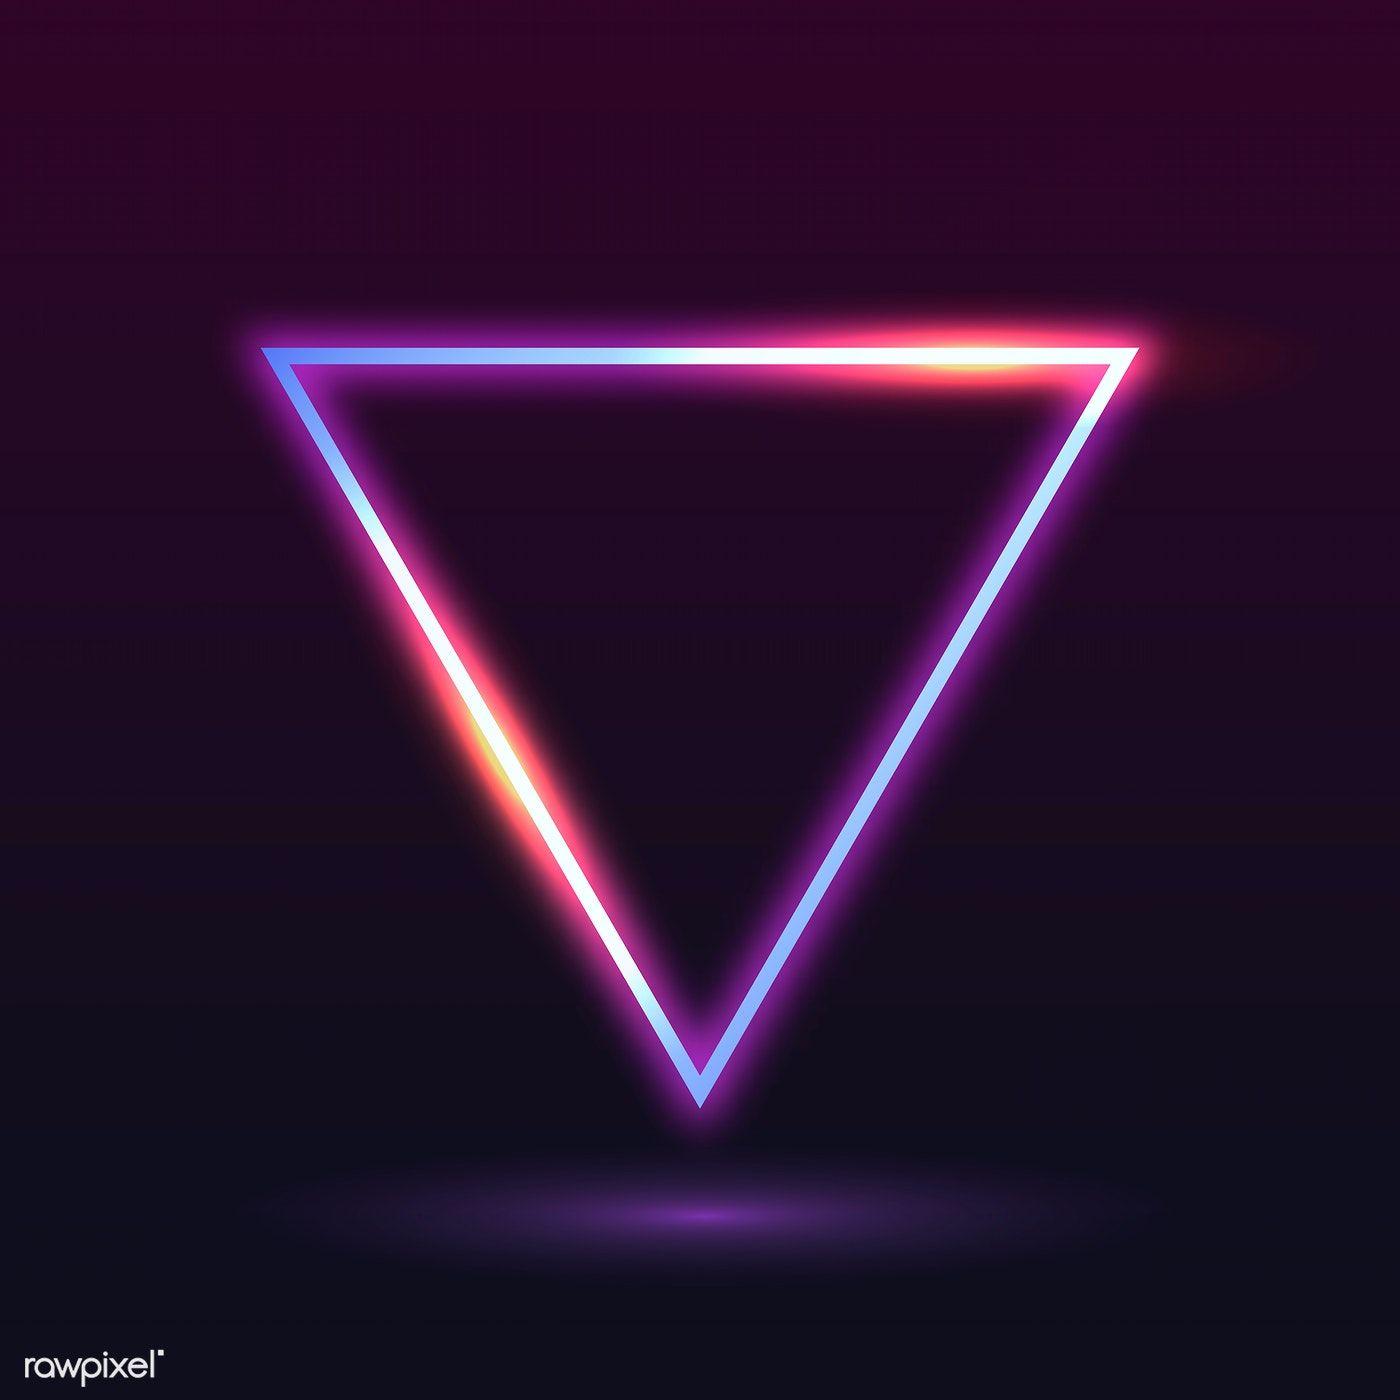 Retro Neon Triangle Badge Vector Free Image By Rawpixel Com Ningzk V Taus Neon Png Neon Wallpaper Neon